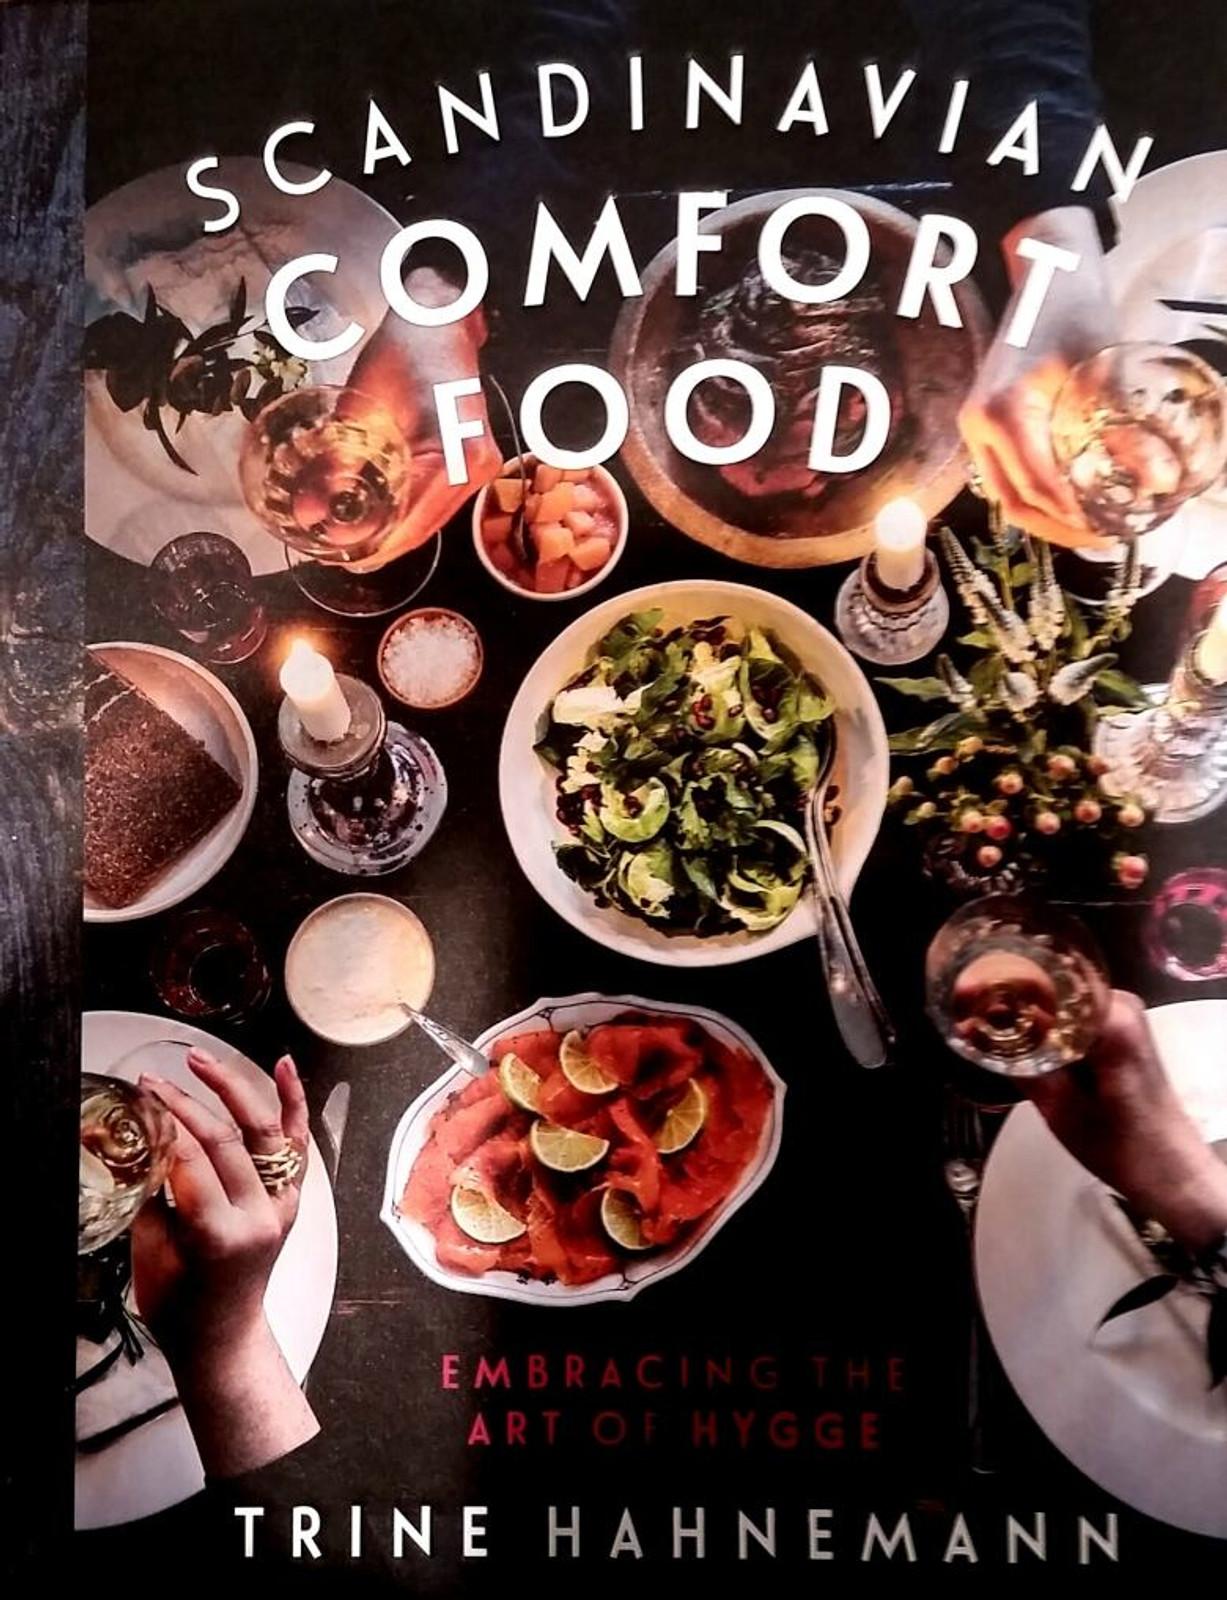 Scandinavian Comfort Food: Embracing the Art of Hygge, Trine Hahnemann (978-1-8494-9859-3)